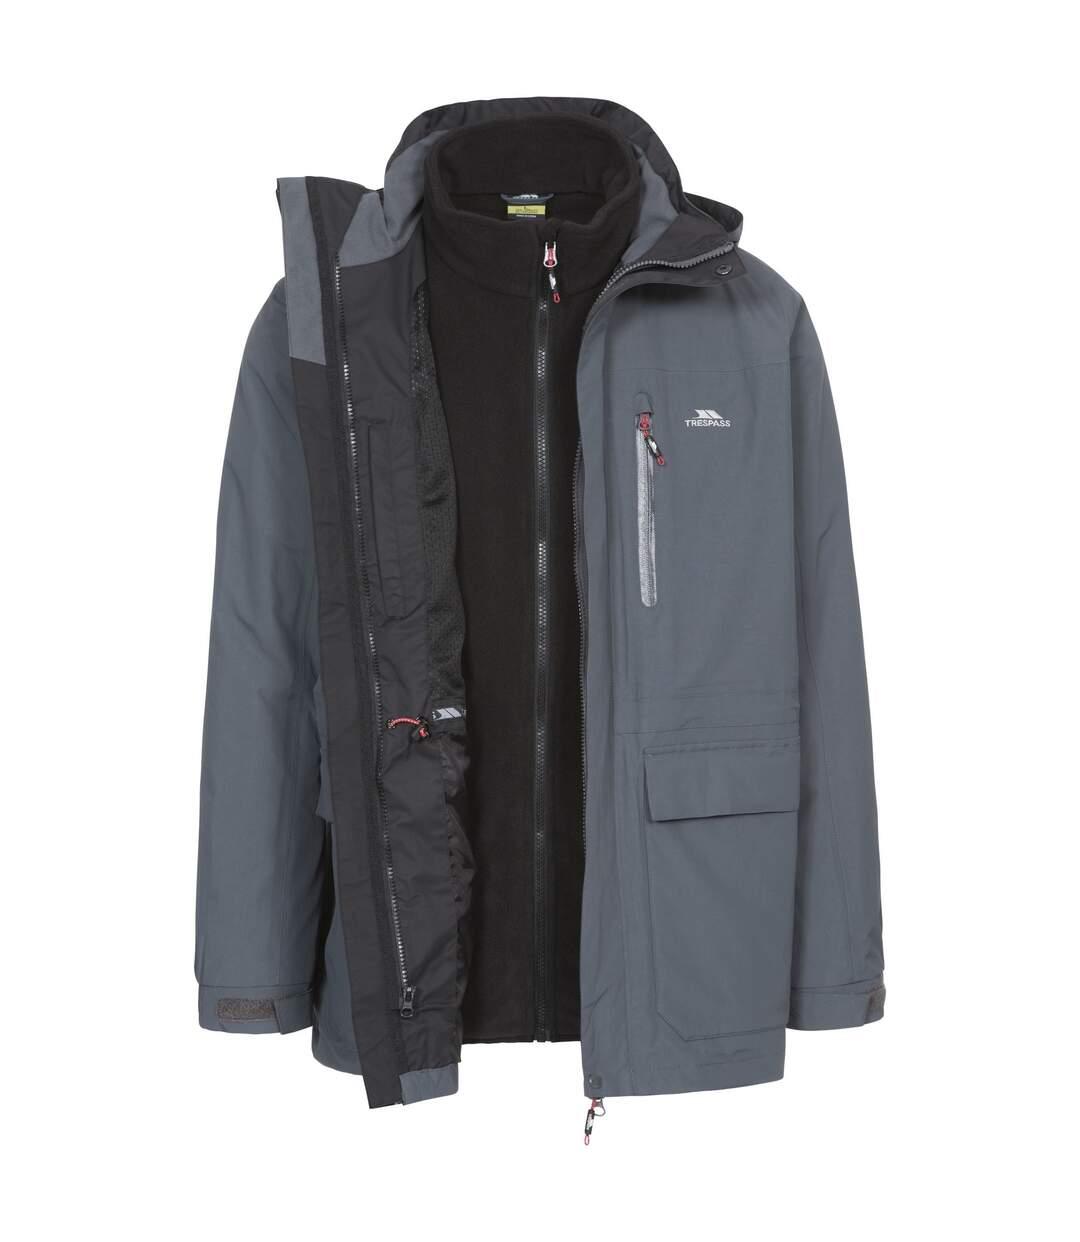 Trespass Mens Edgewater II 3 In 1 Waterproof Jacket (Carbon) - UTTP3772